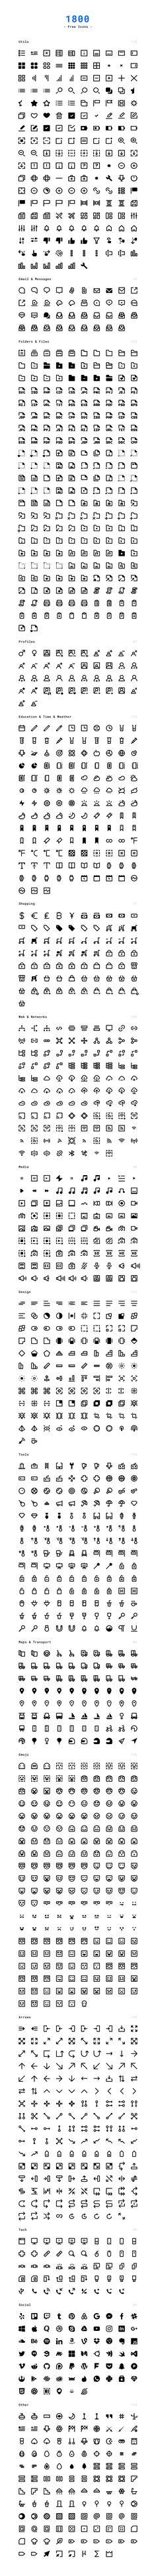 Minimal Icon Pack